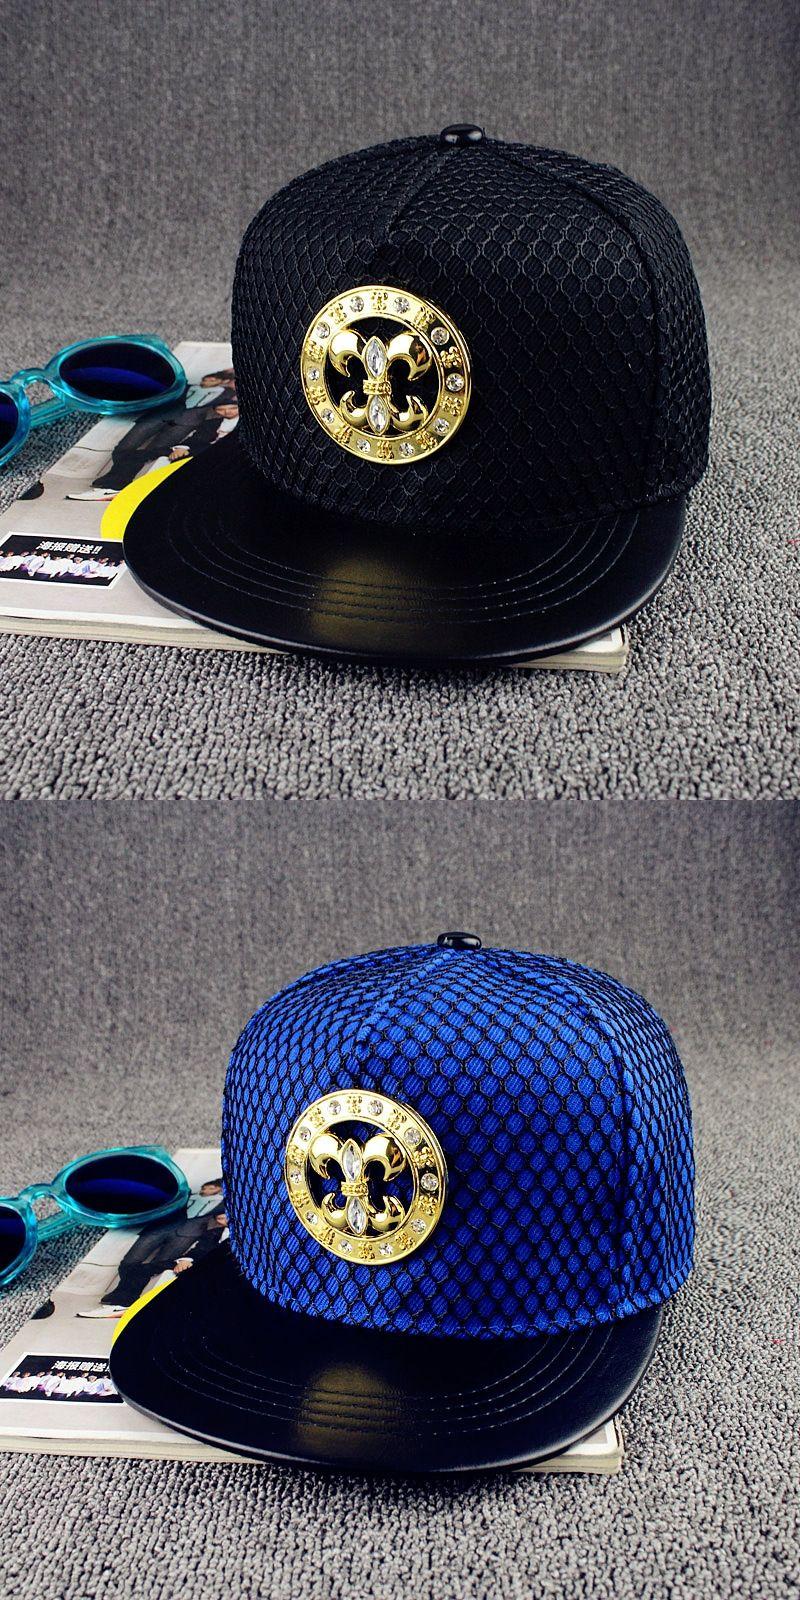 261352850cc Trendy Men s Women s Baseball Snapback Hat Hip-hop Travel Sports Outdoor Cap  Adjustable